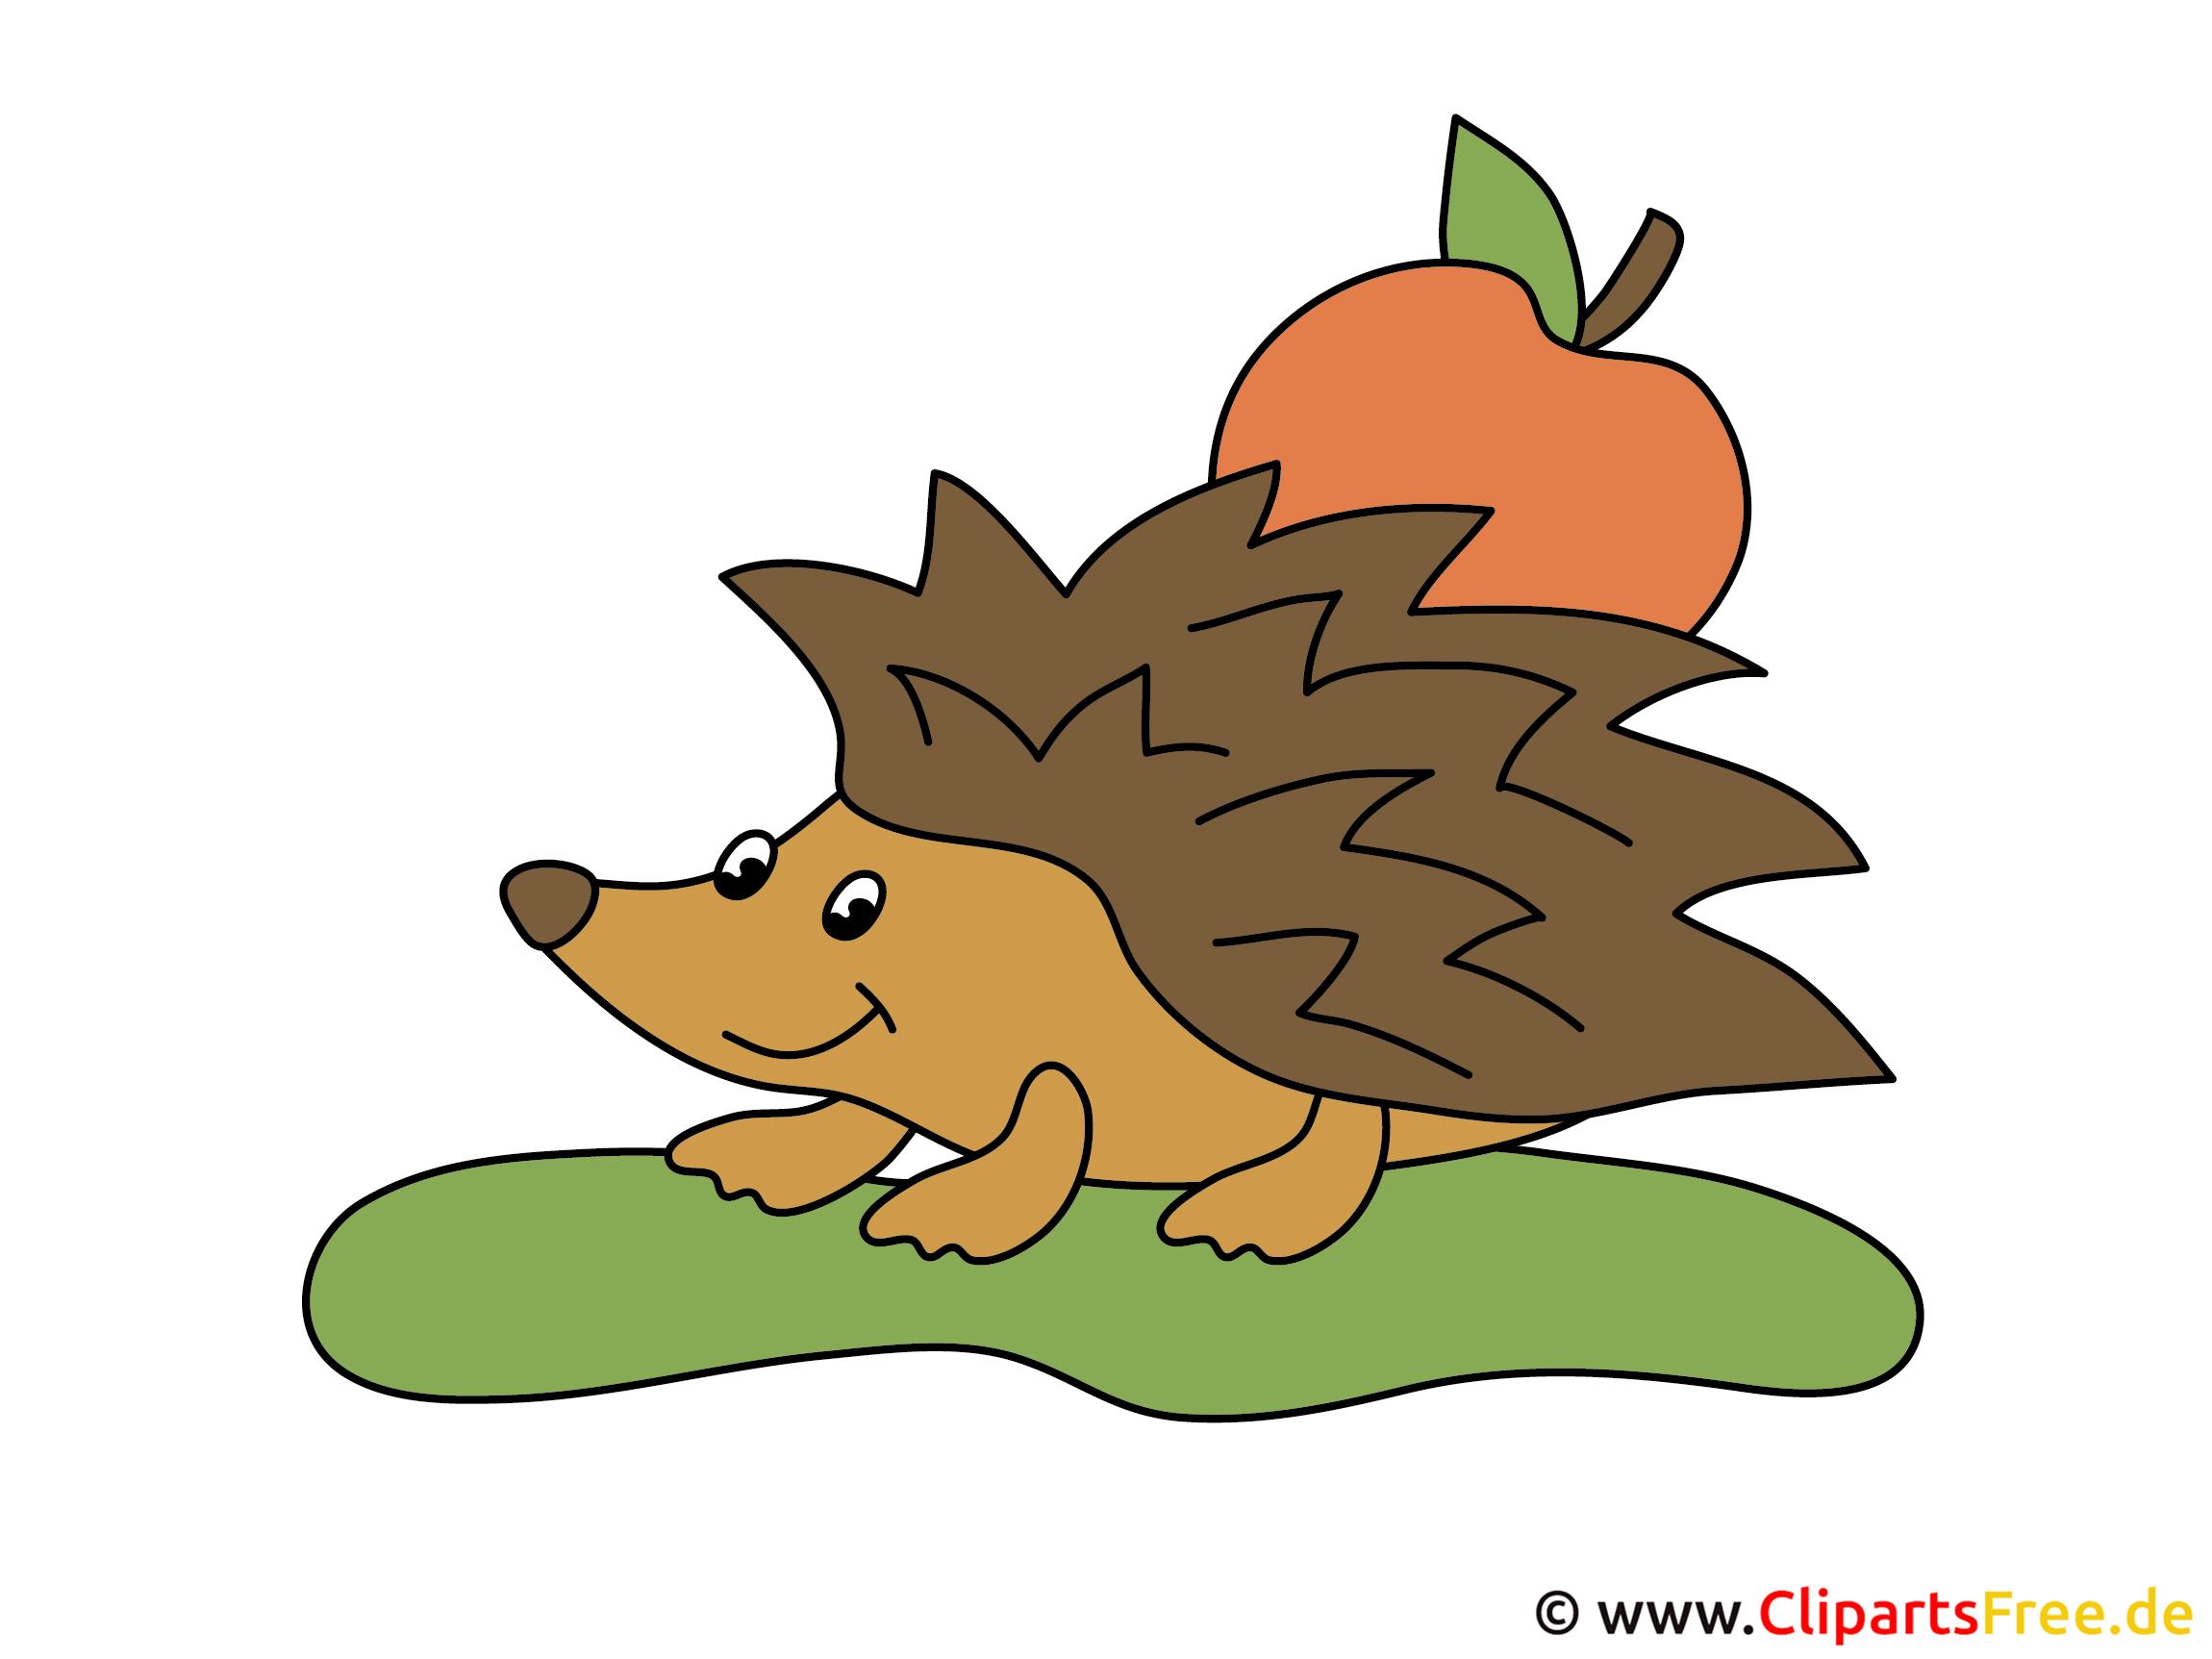 Igel mit Apfel Comic